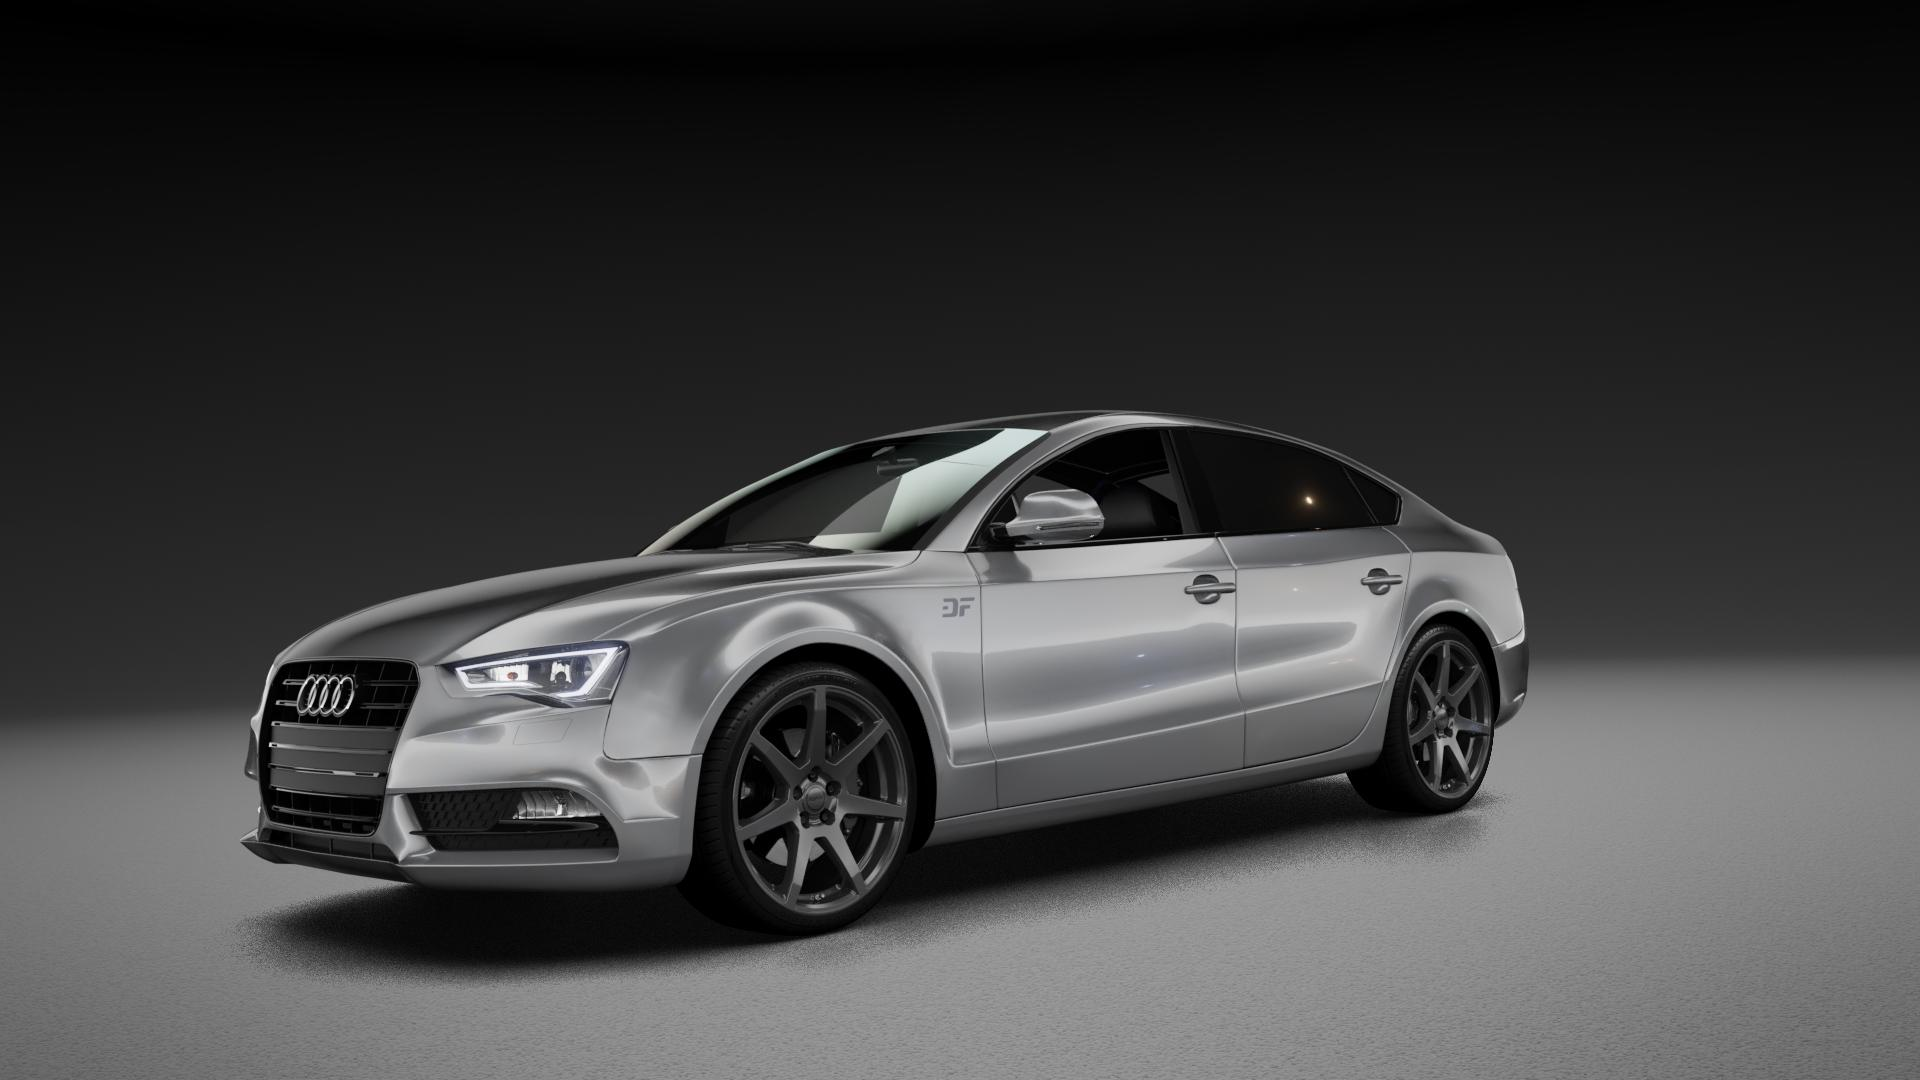 ALUTEC Pearl carbon-grau Felge mit Reifen in 19Zoll Winterfelge Alufelge auf silbernem Audi A5 Typ B8 (Sportback) Facelift ⬇️ mit 15mm Tieferlegung ⬇️ Neutral_mid_max5300mm Frontansicht_1